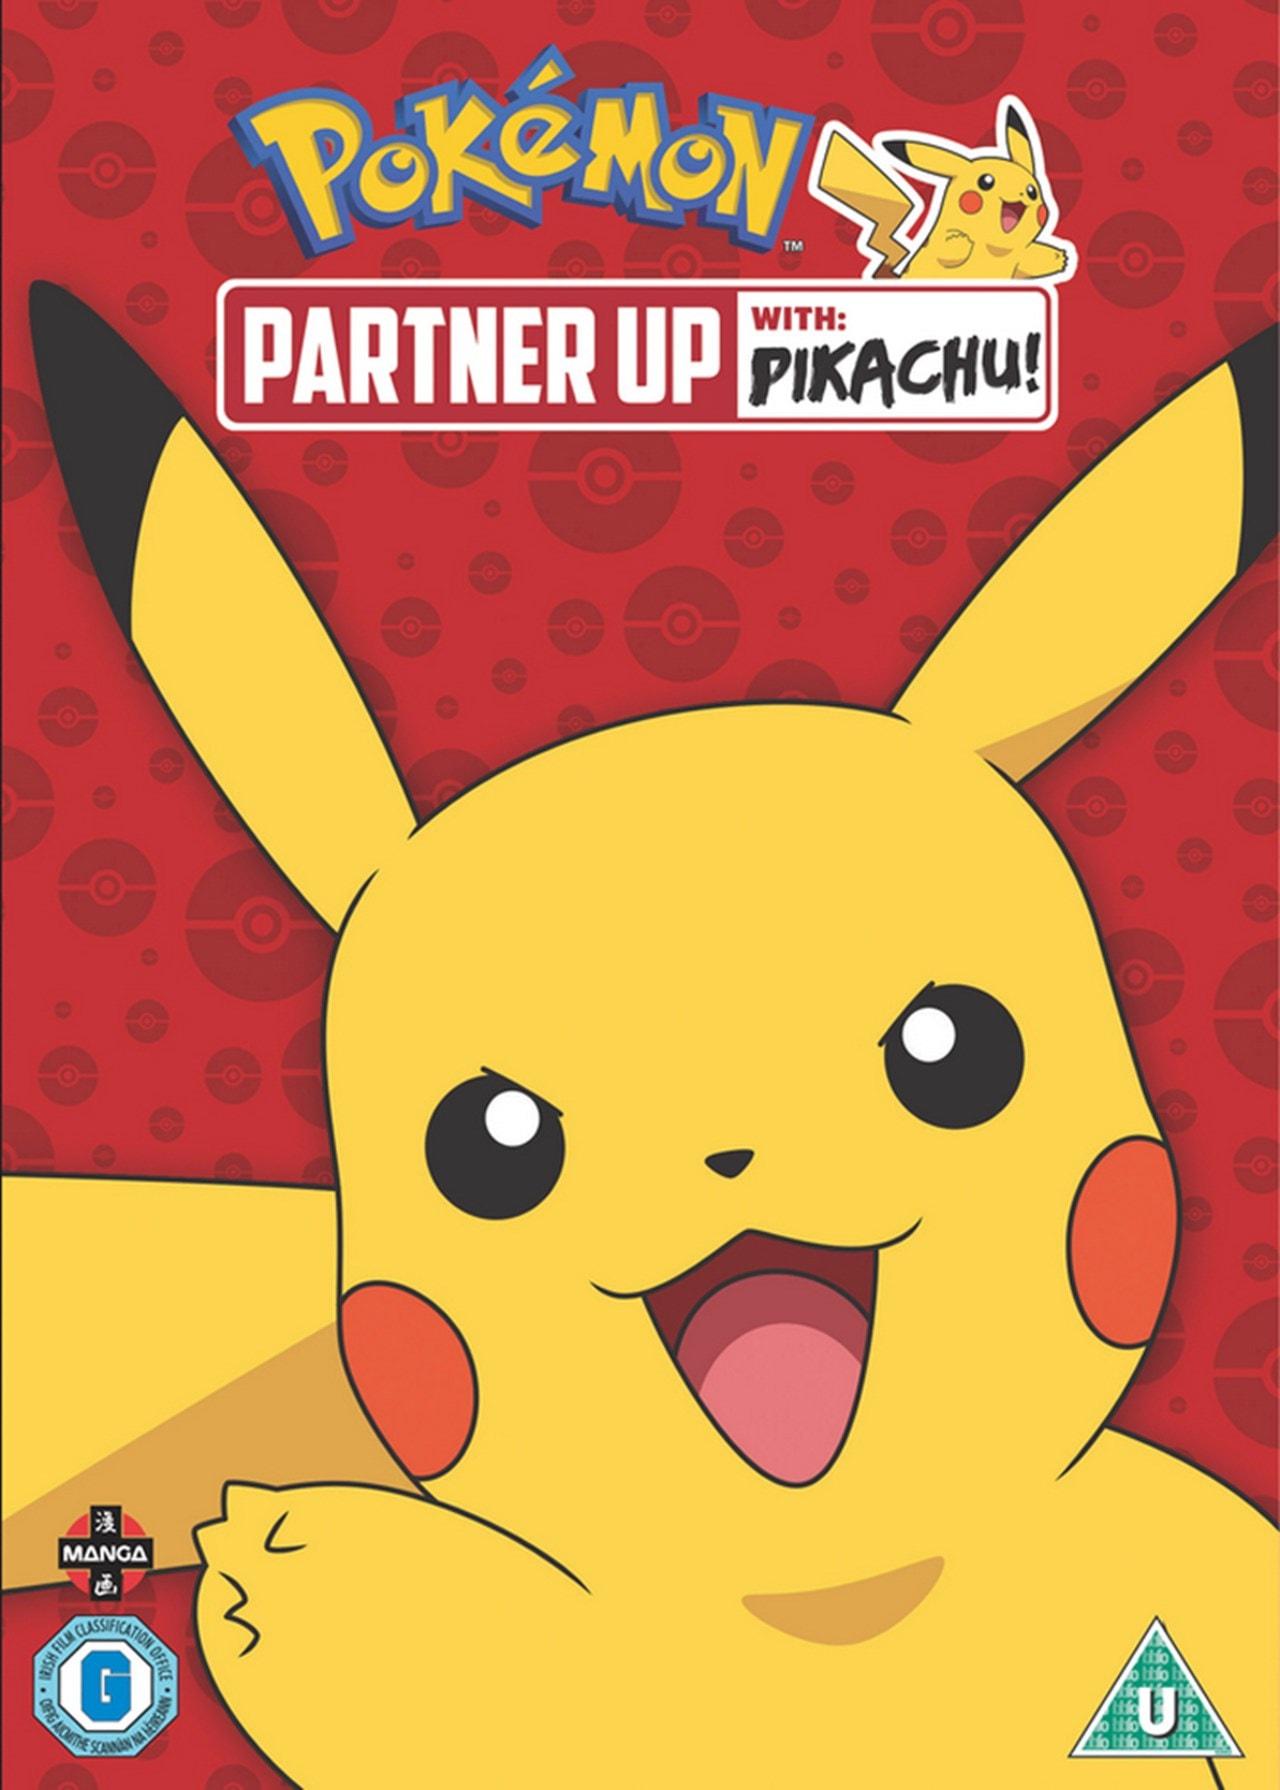 Pokemon: Partner Up With Pikachu! - 2